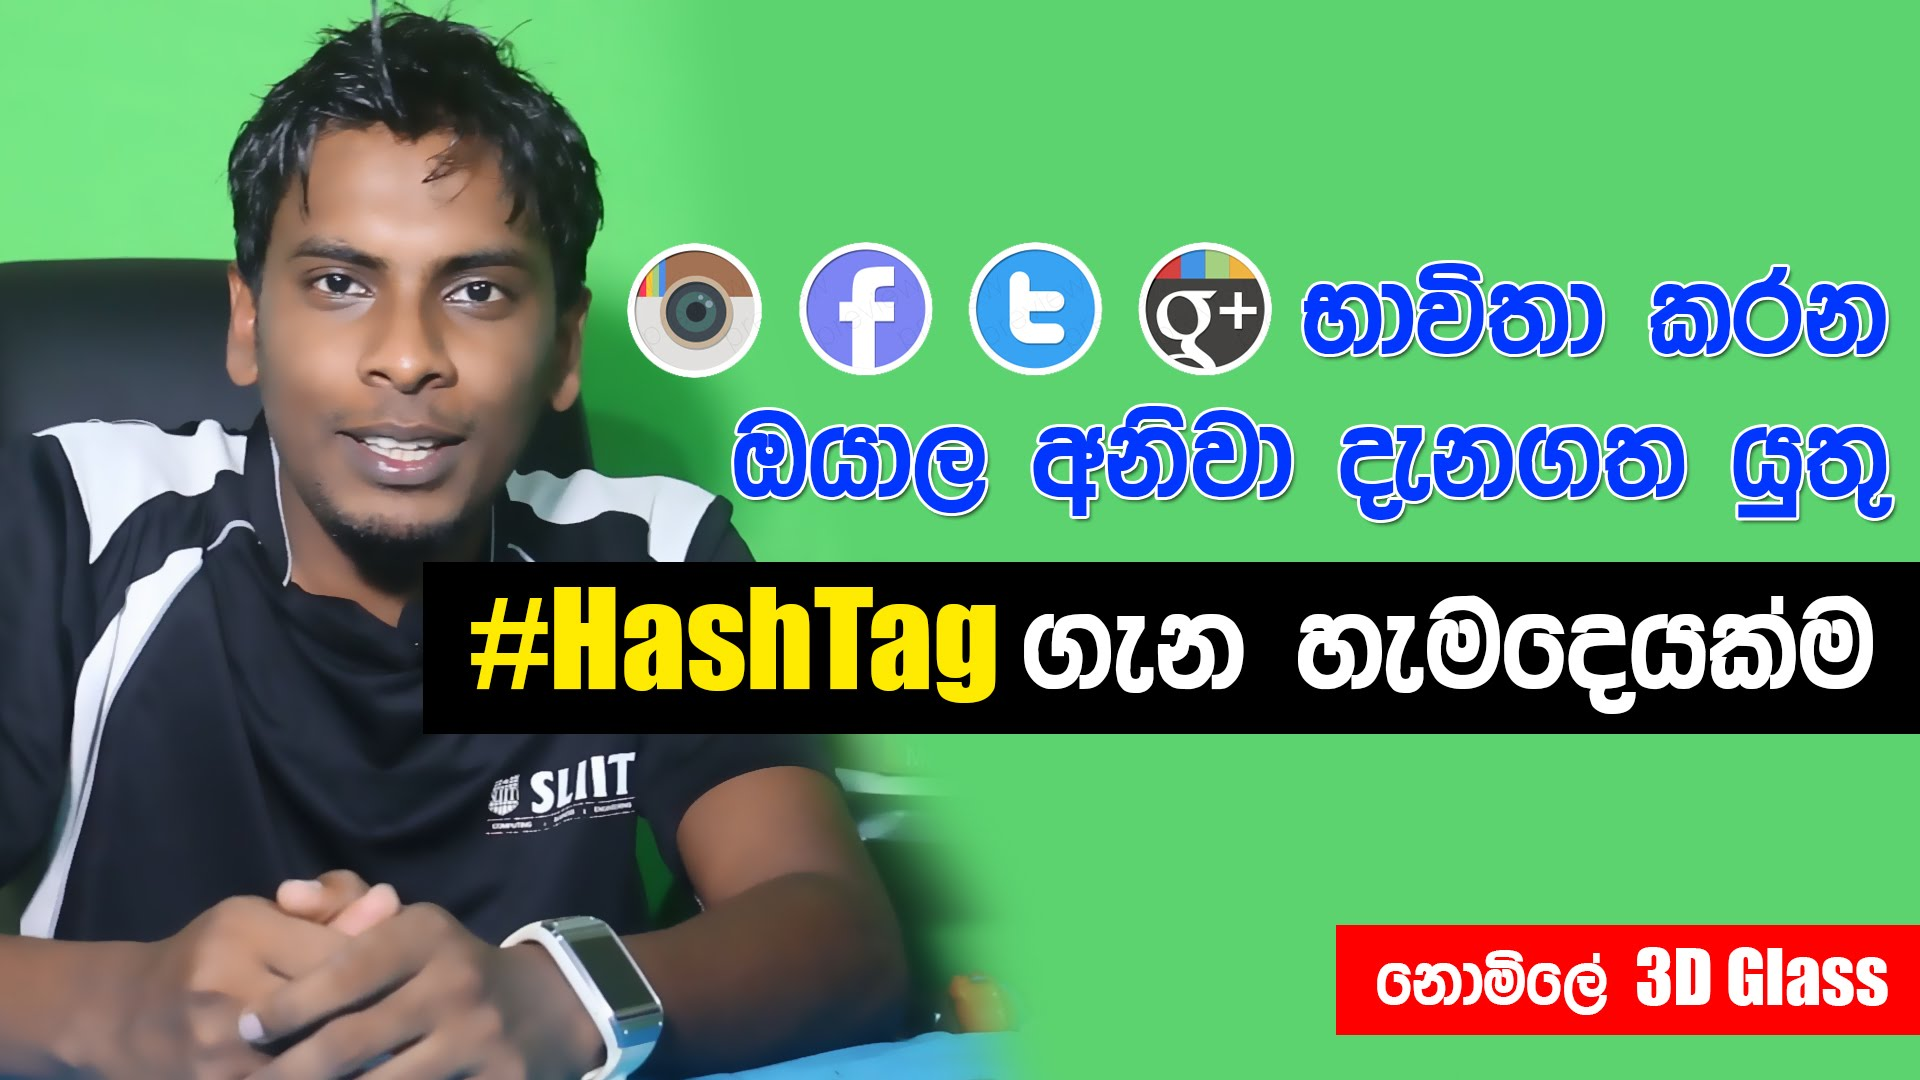 [Video] Facebook, Twitter වල තියෙන Hashtag එක කියන්නේ මොකද්ද?